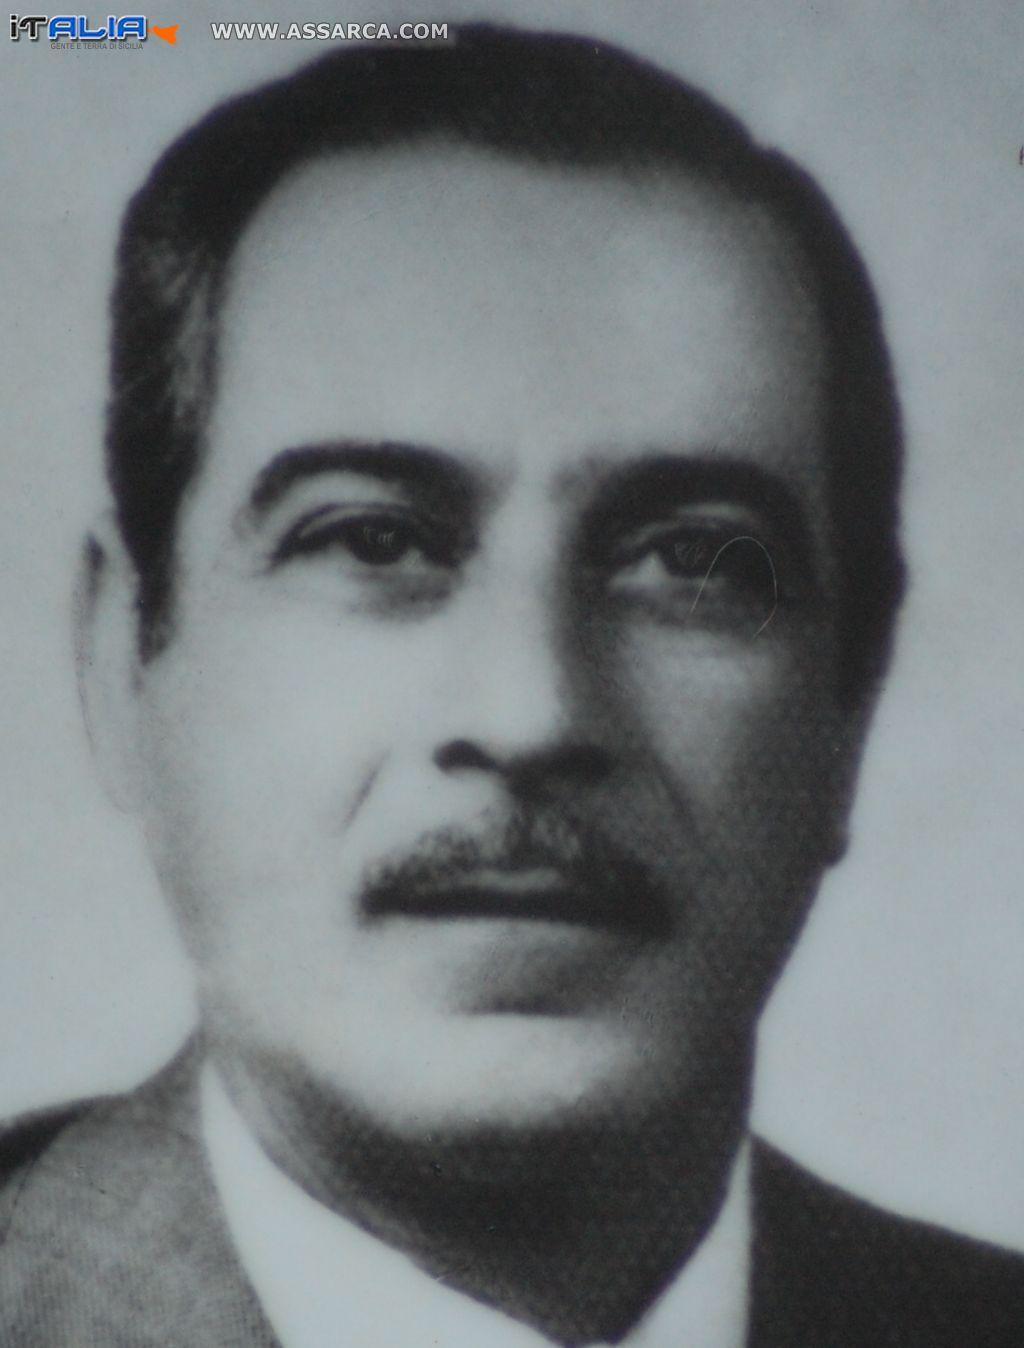 Paolo Surdo